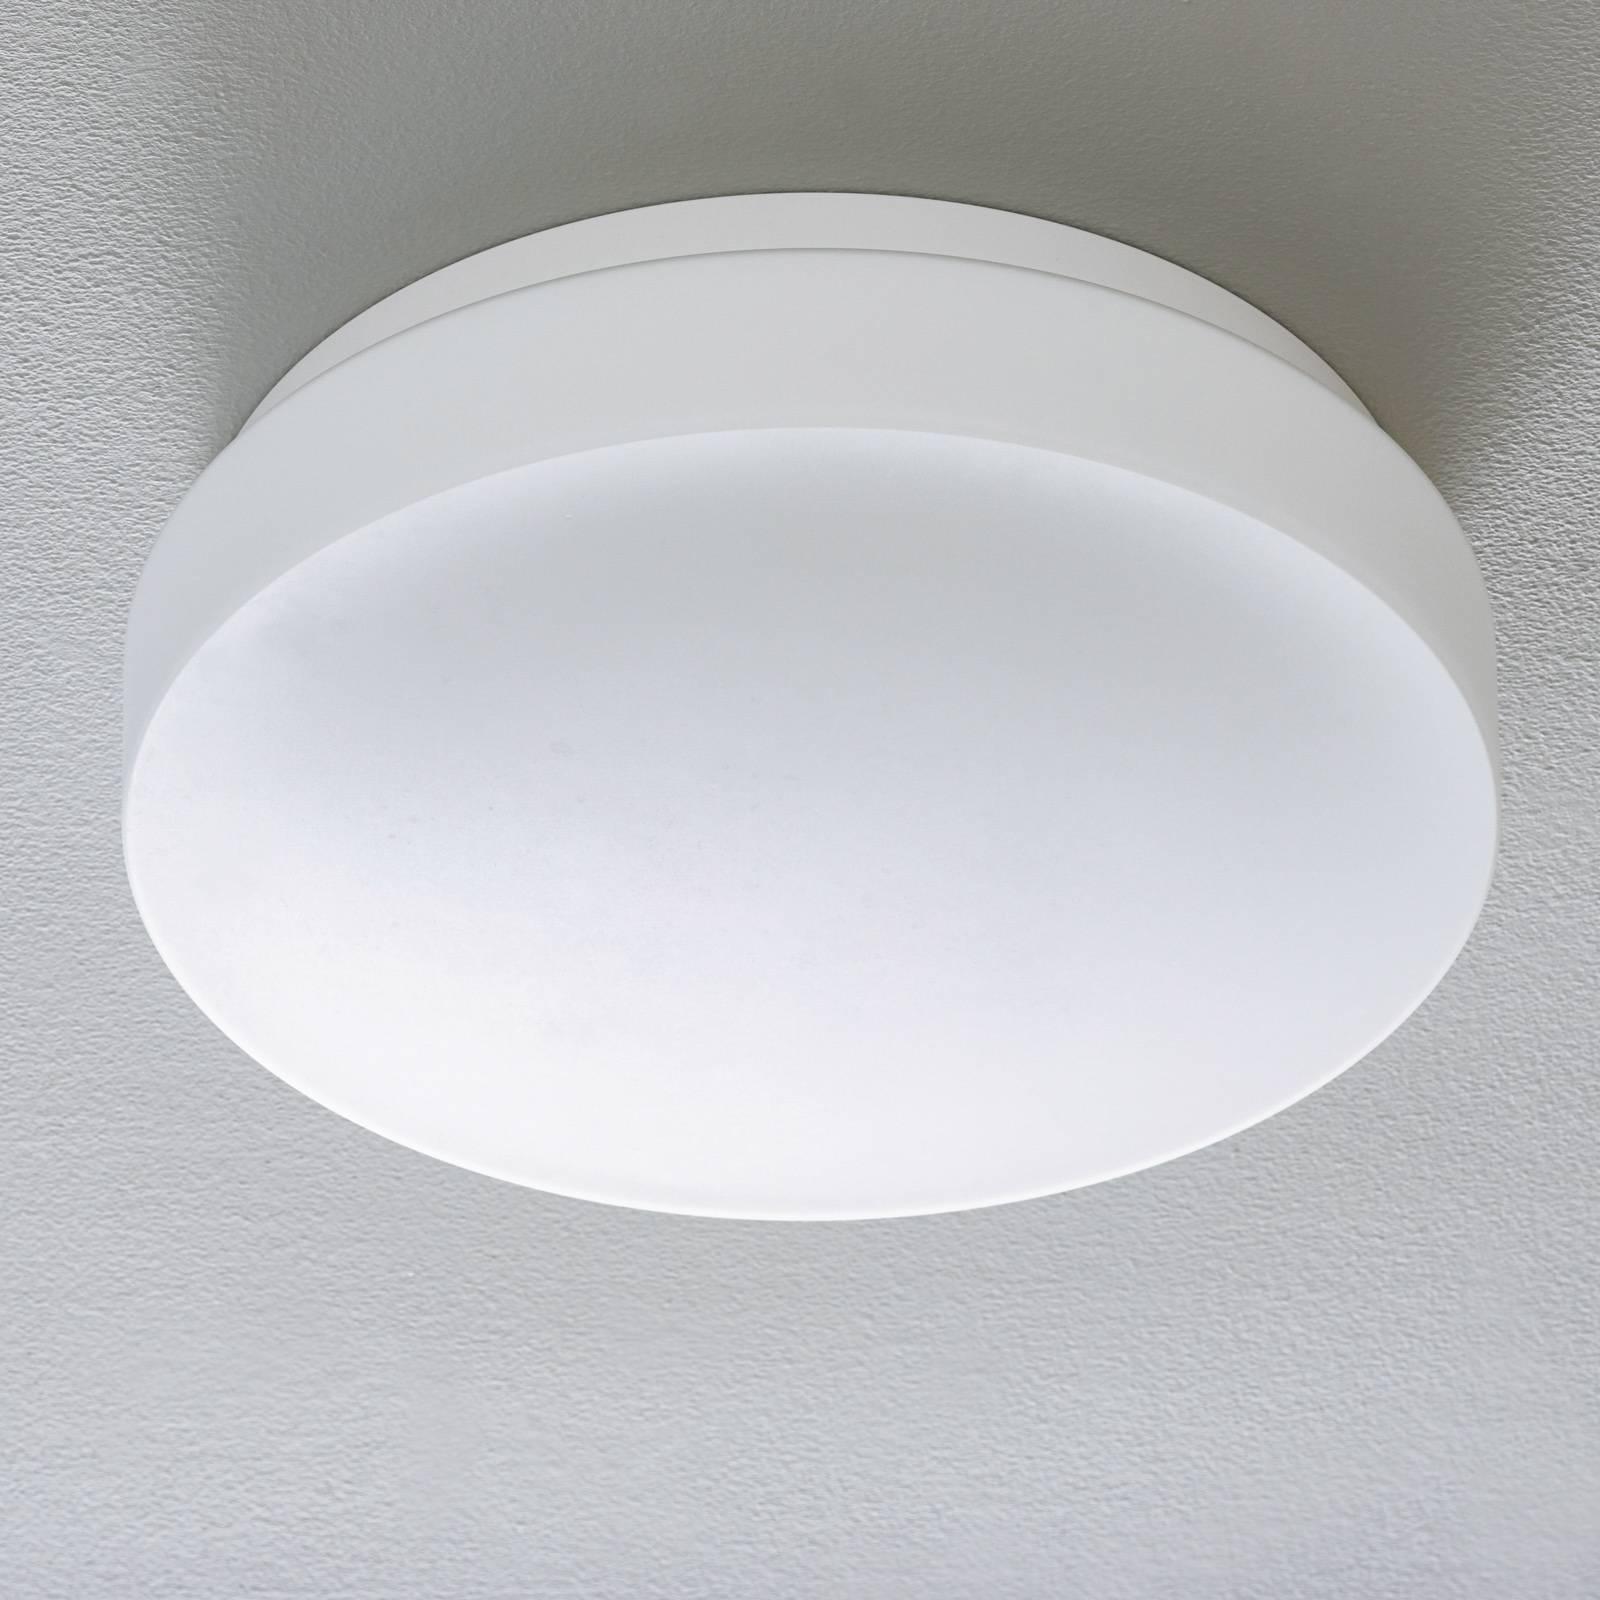 BEGA 50081 LED-kattovalaisin DALI 3 000K Ø47cm